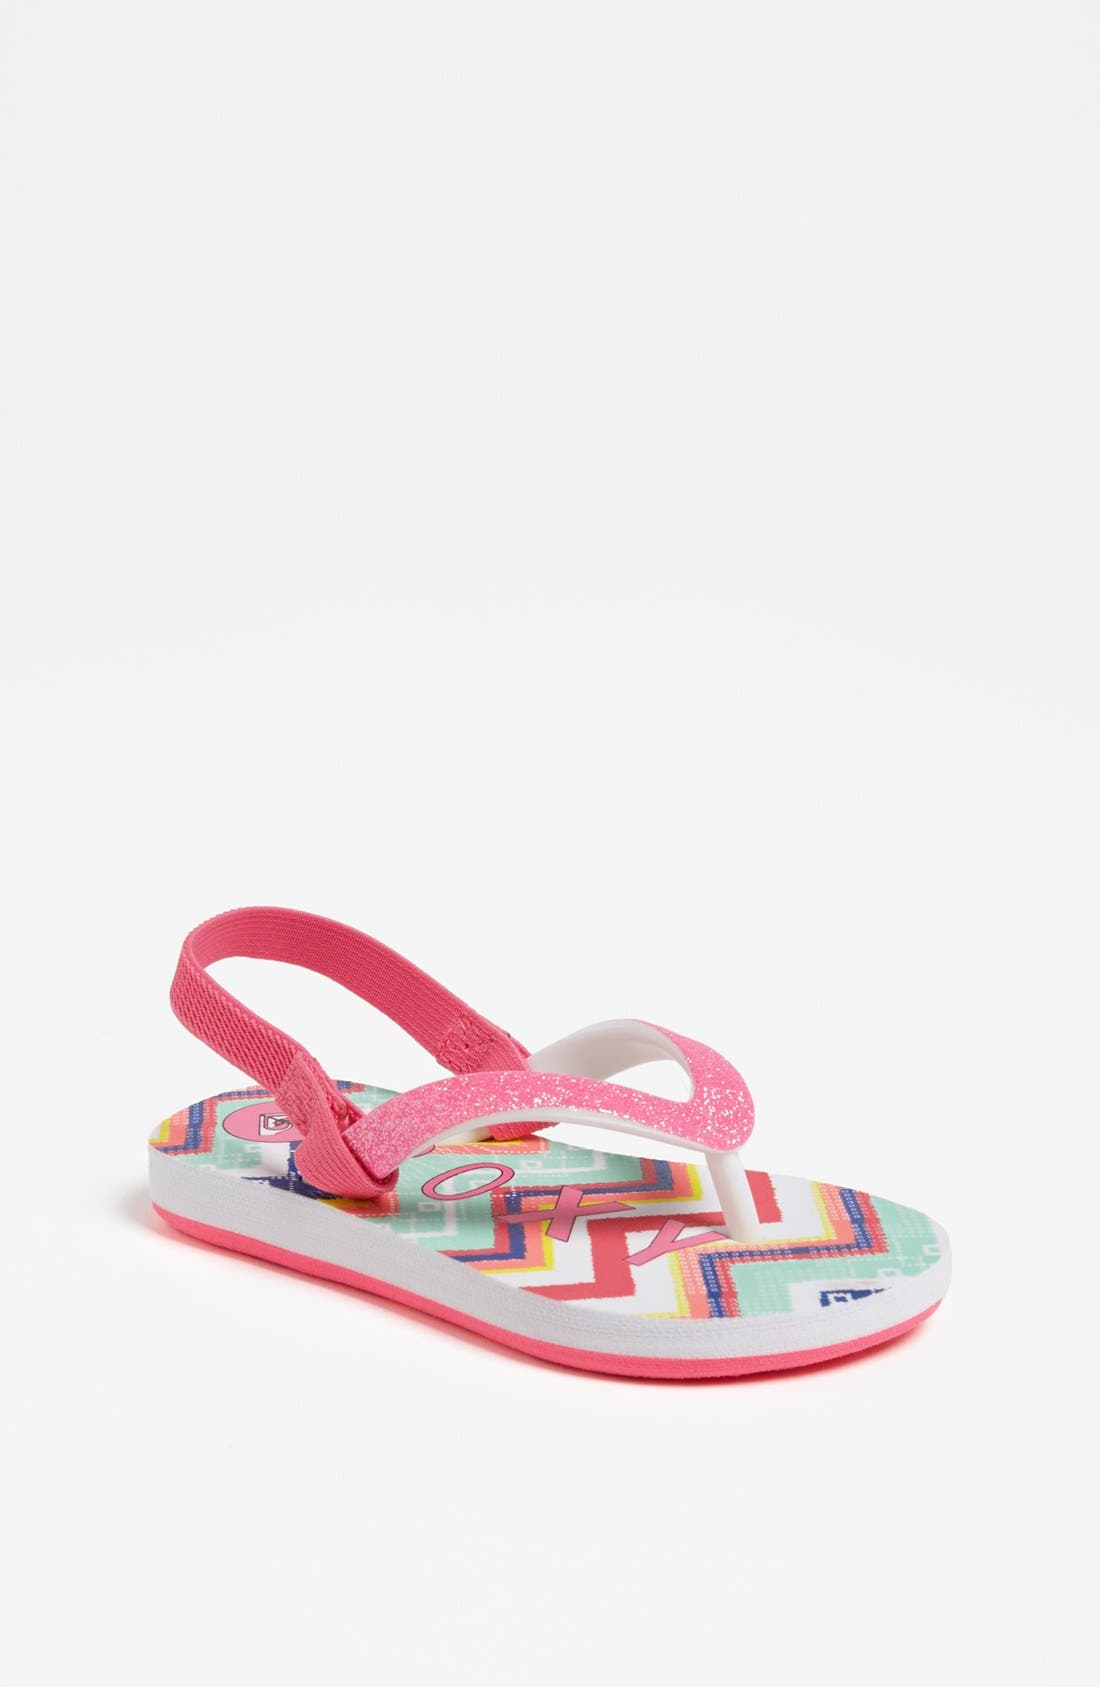 Main Image - Roxy 'Tahiti' Sandal (Walker & Toddler)